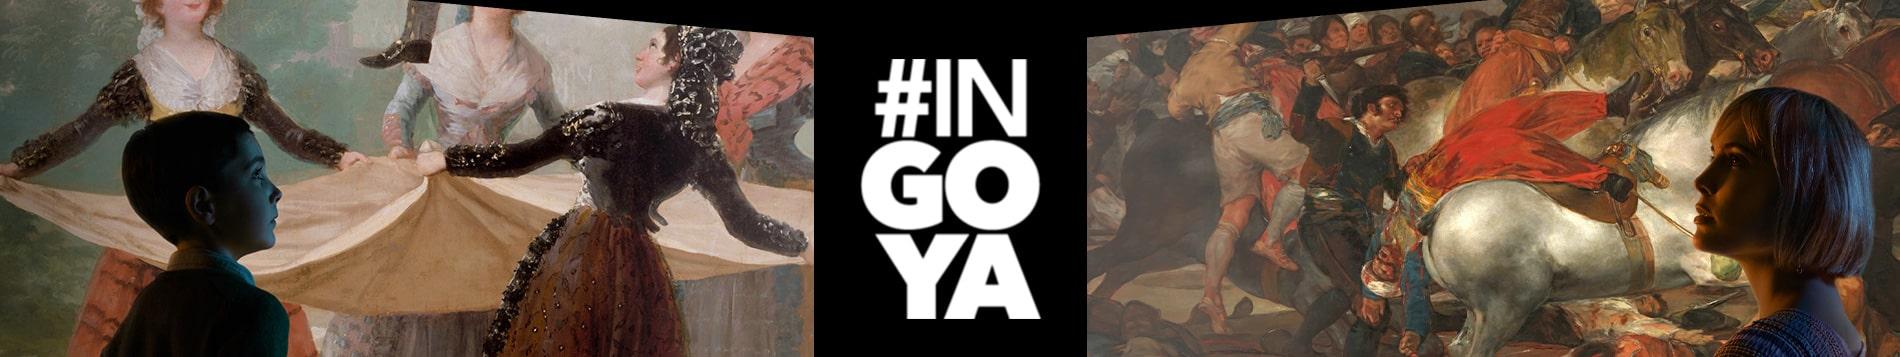 Ingoya